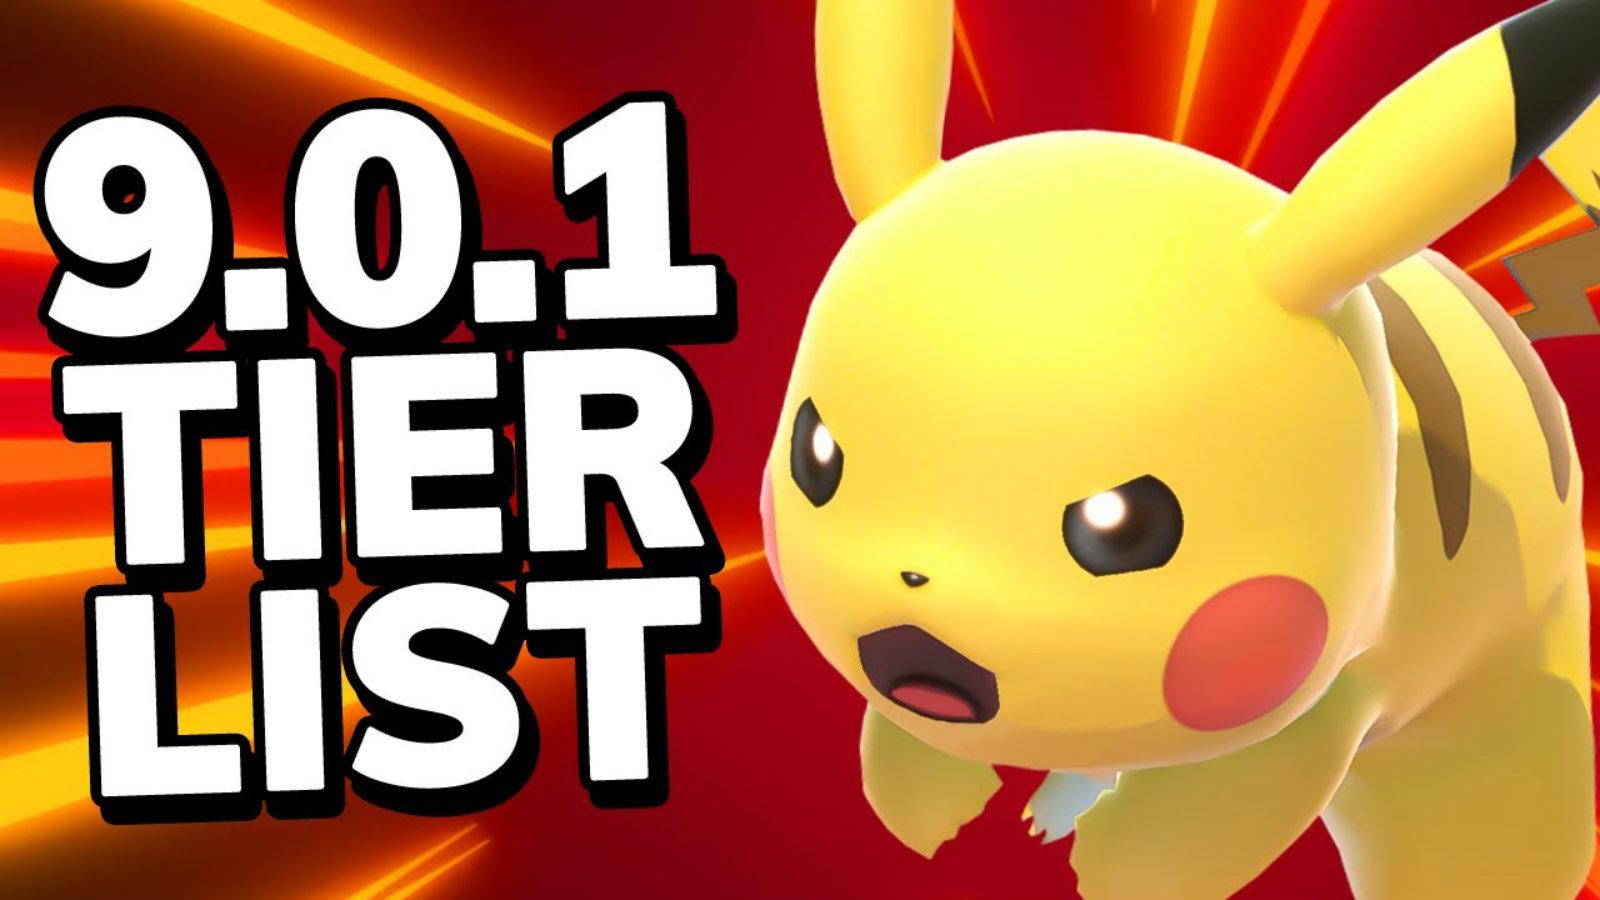 Pikachu in Smash tier list